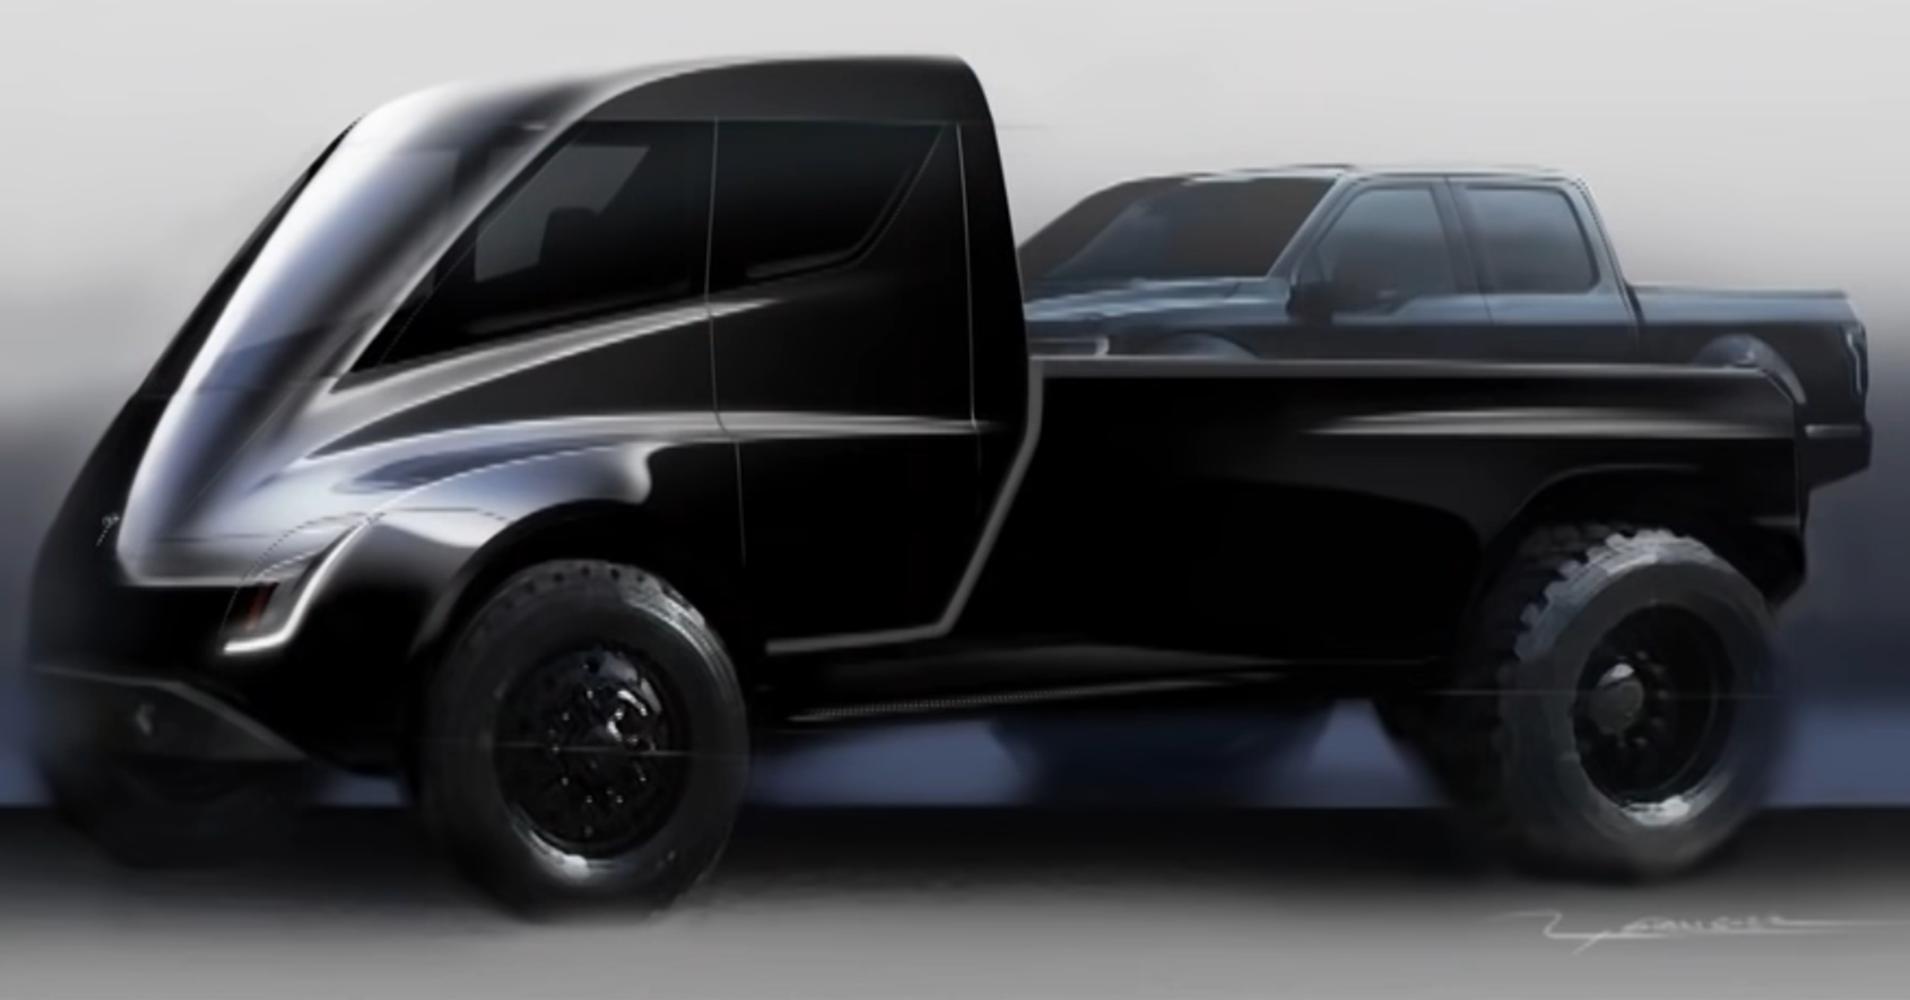 99 All New 2019 Tesla Semi Truck Rumors with 2019 Tesla Semi Truck